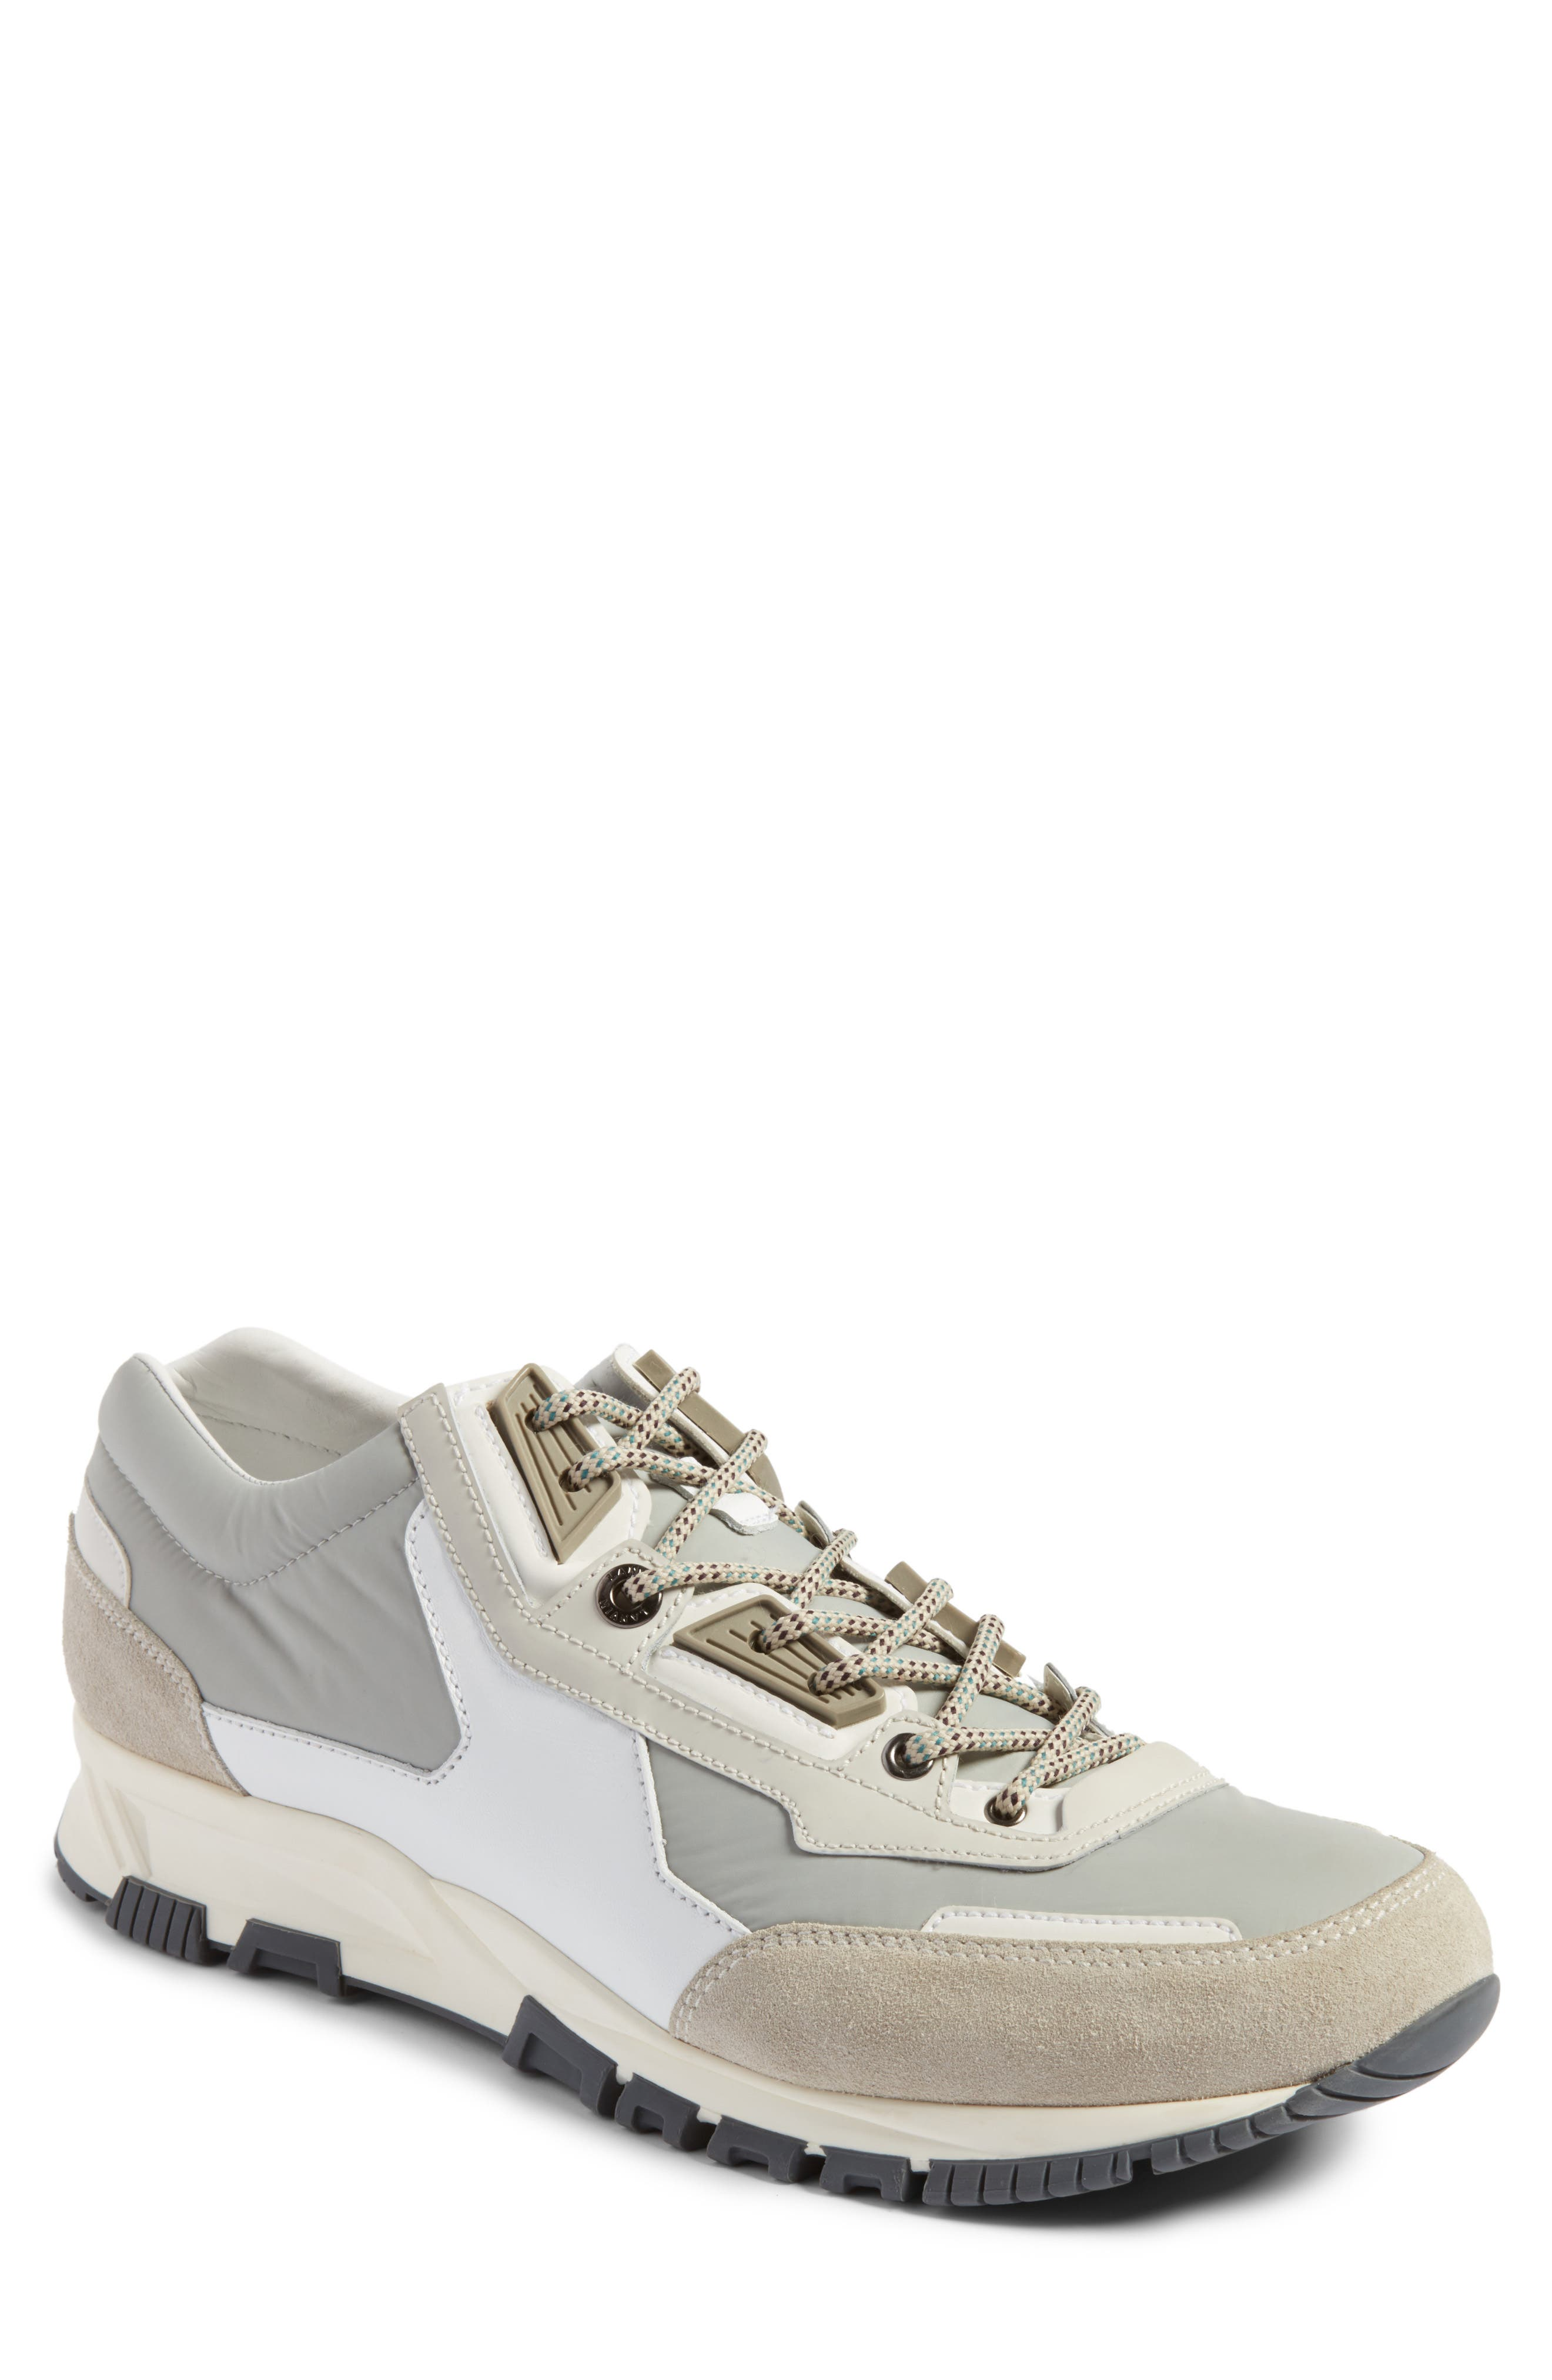 Alternate Image 1 Selected - Lanvin Running Sneaker (Men)